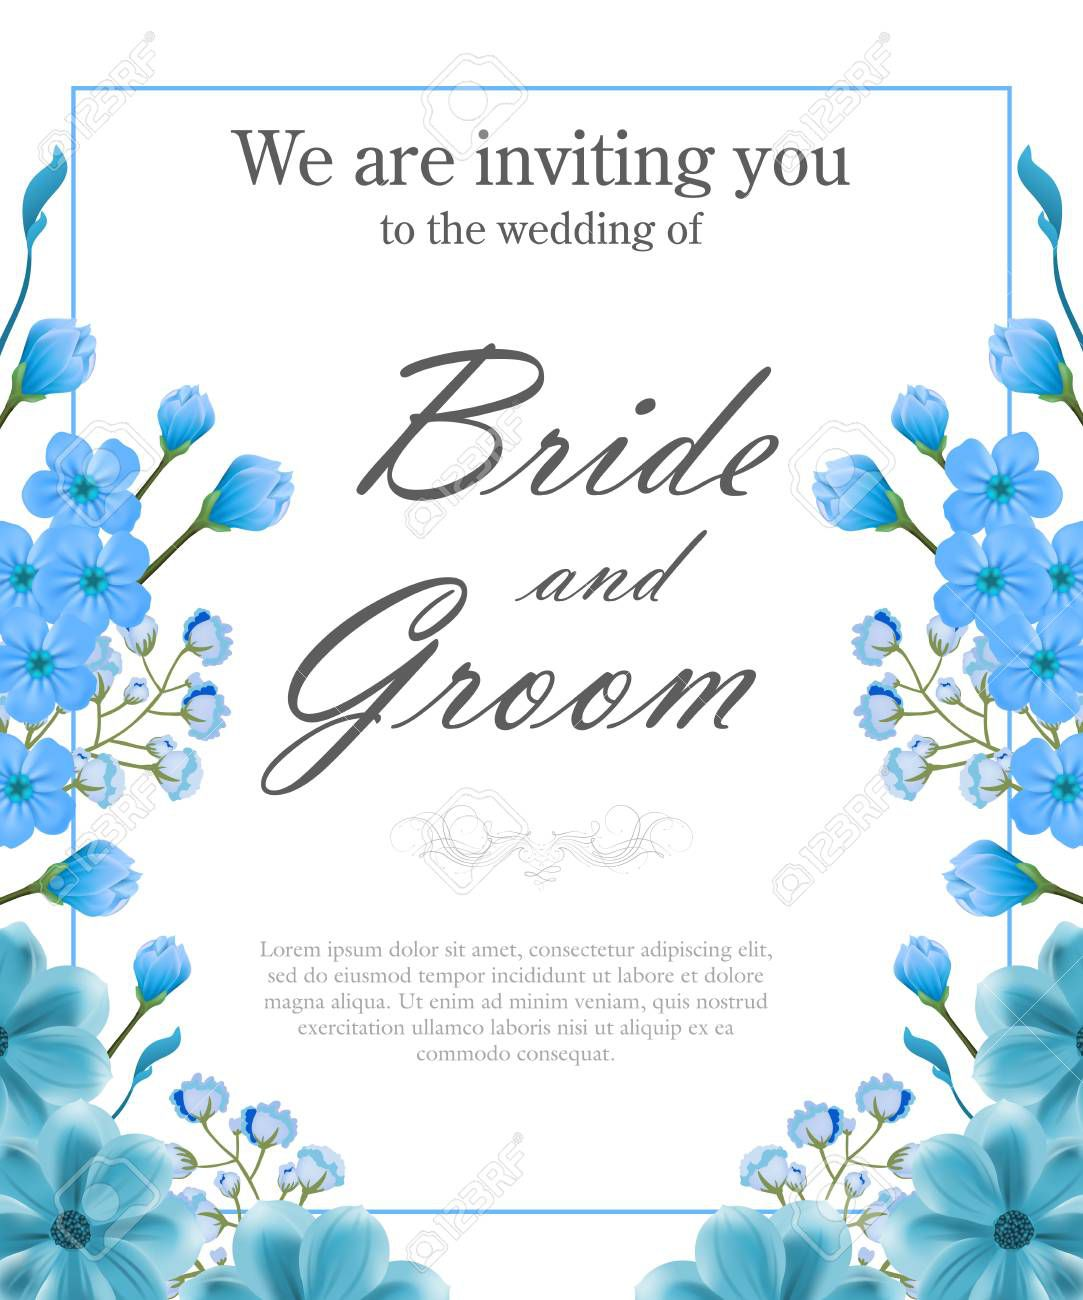 005 Imposing Sample Wedding Invitation Template Image  Templates Wording CardFull